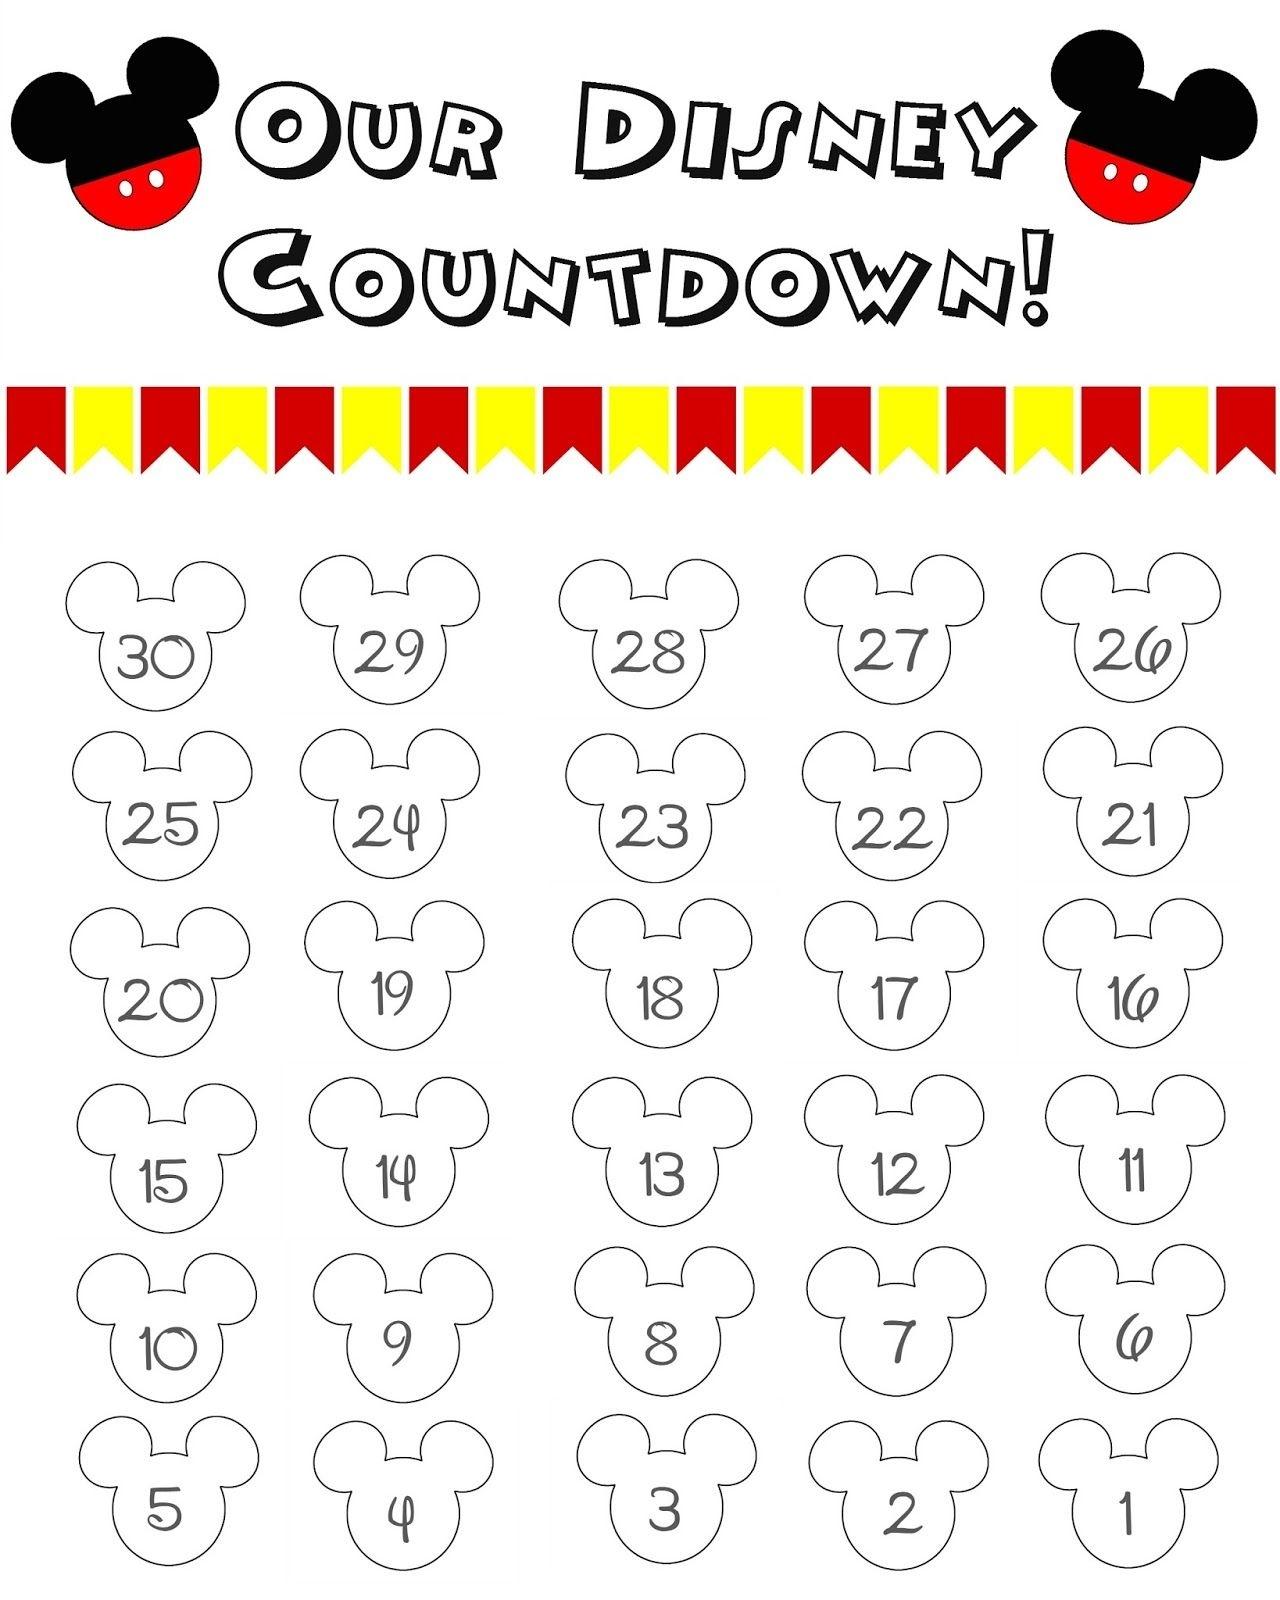 Disney World Countdown Calendar - Free Printable | Disney Remarkable Printable Disney Countdown To 60 Calendar